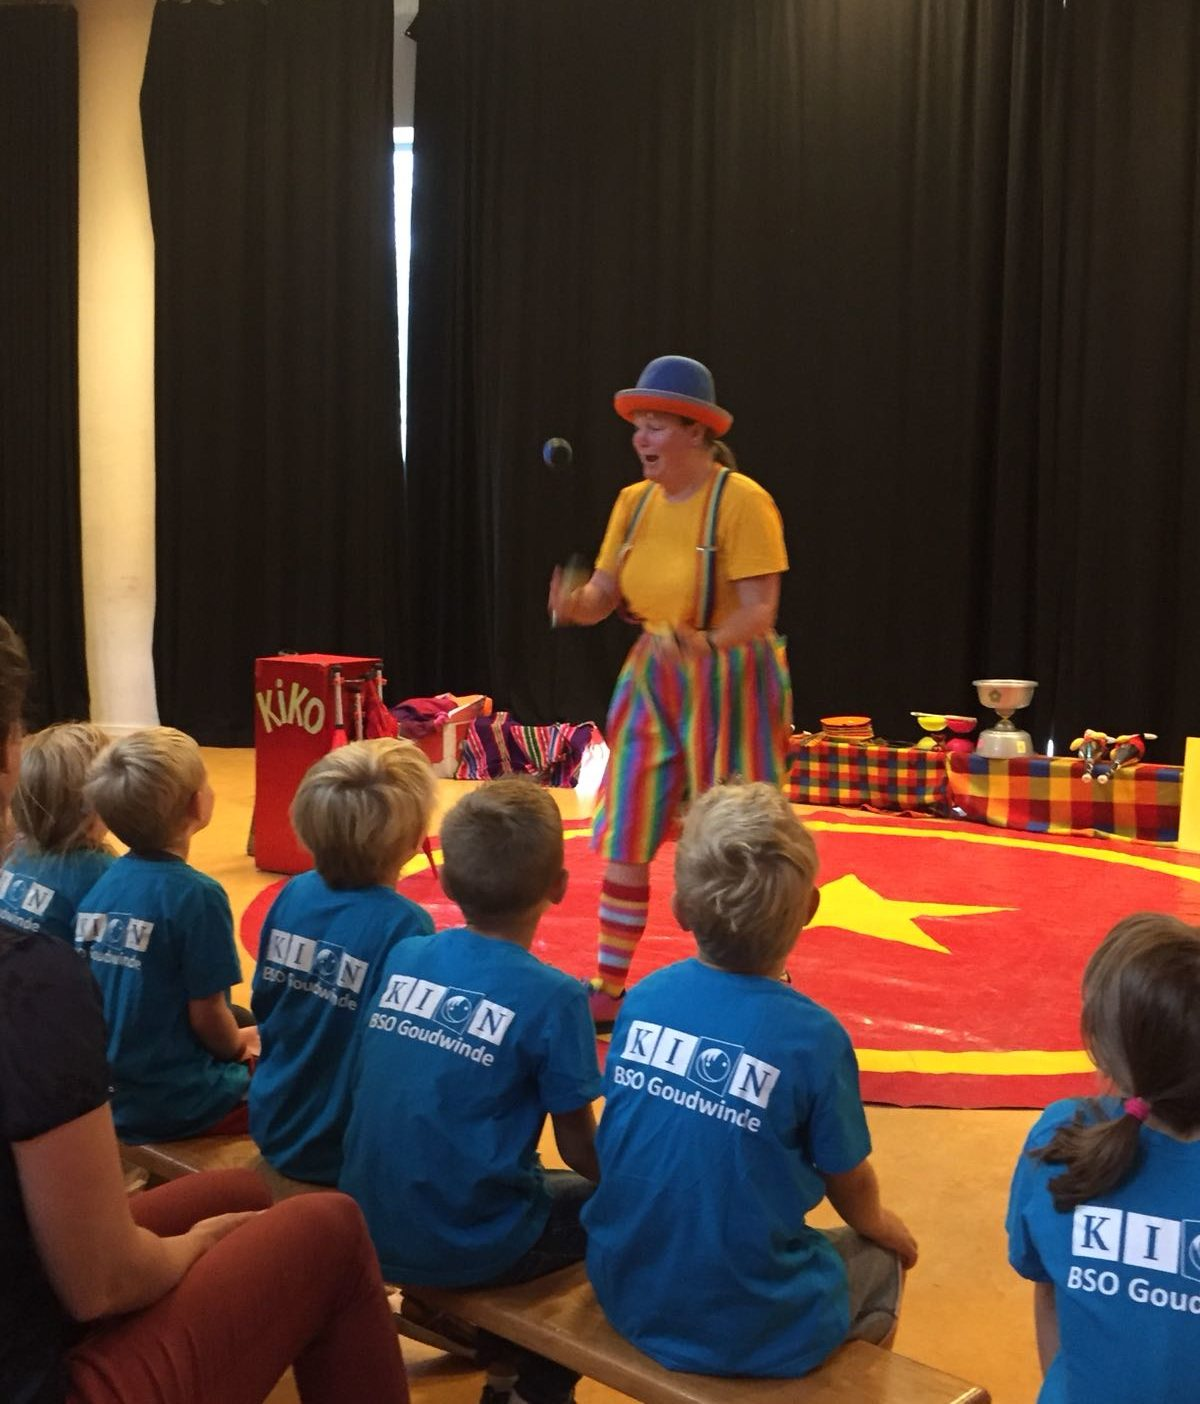 Clown Kiko BSO Kion zomertour jongleershowoorstelling